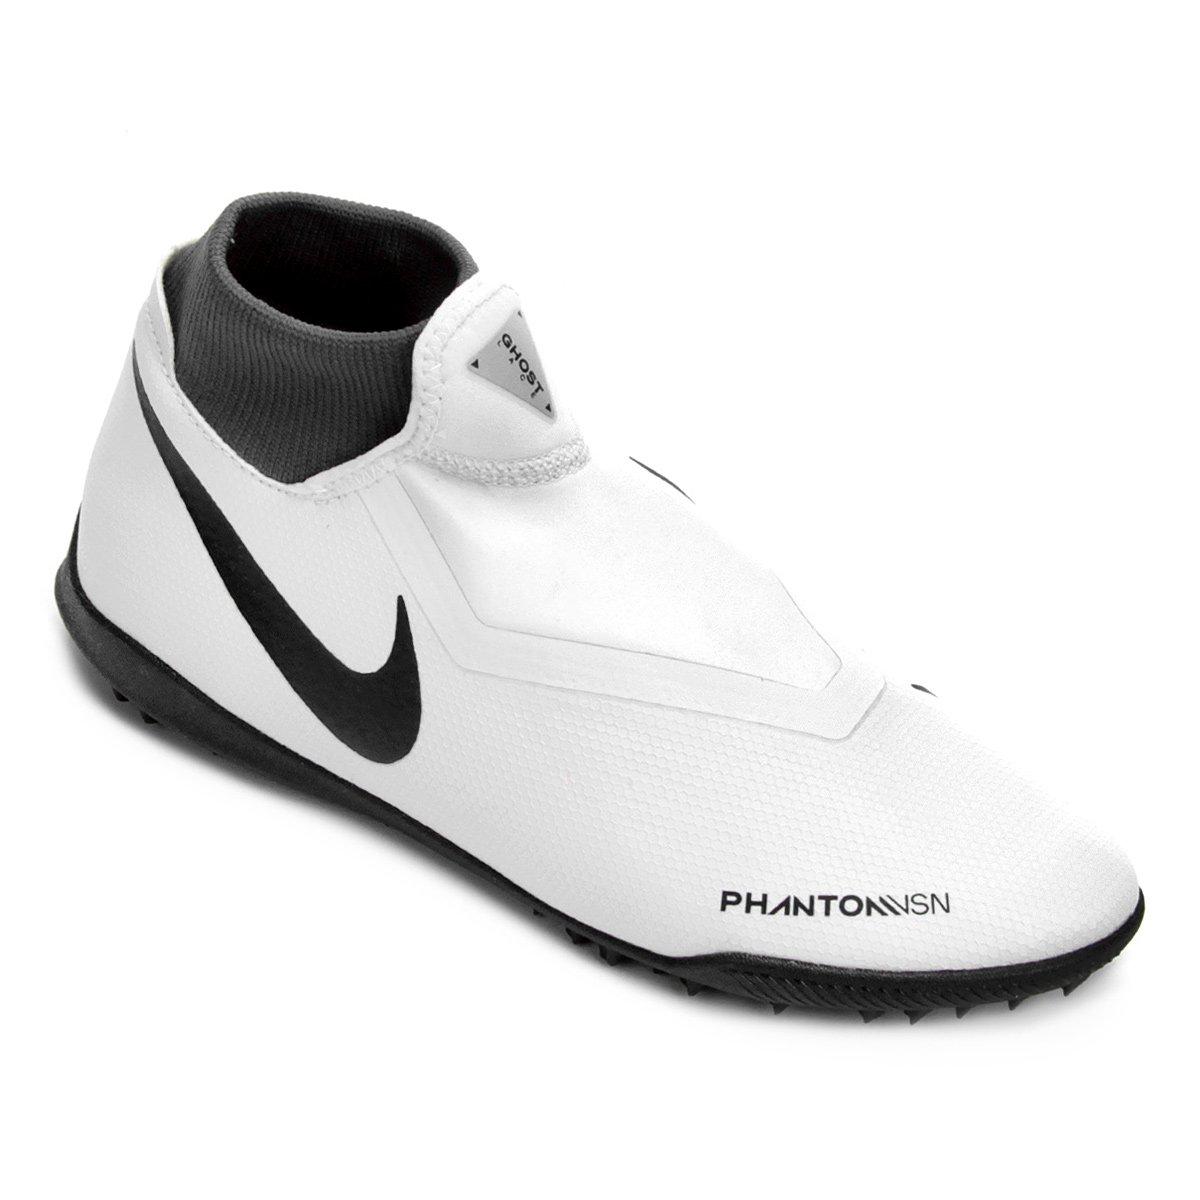 b550492fda Chuteira Society Nike Phantom Vision Academy DF TF